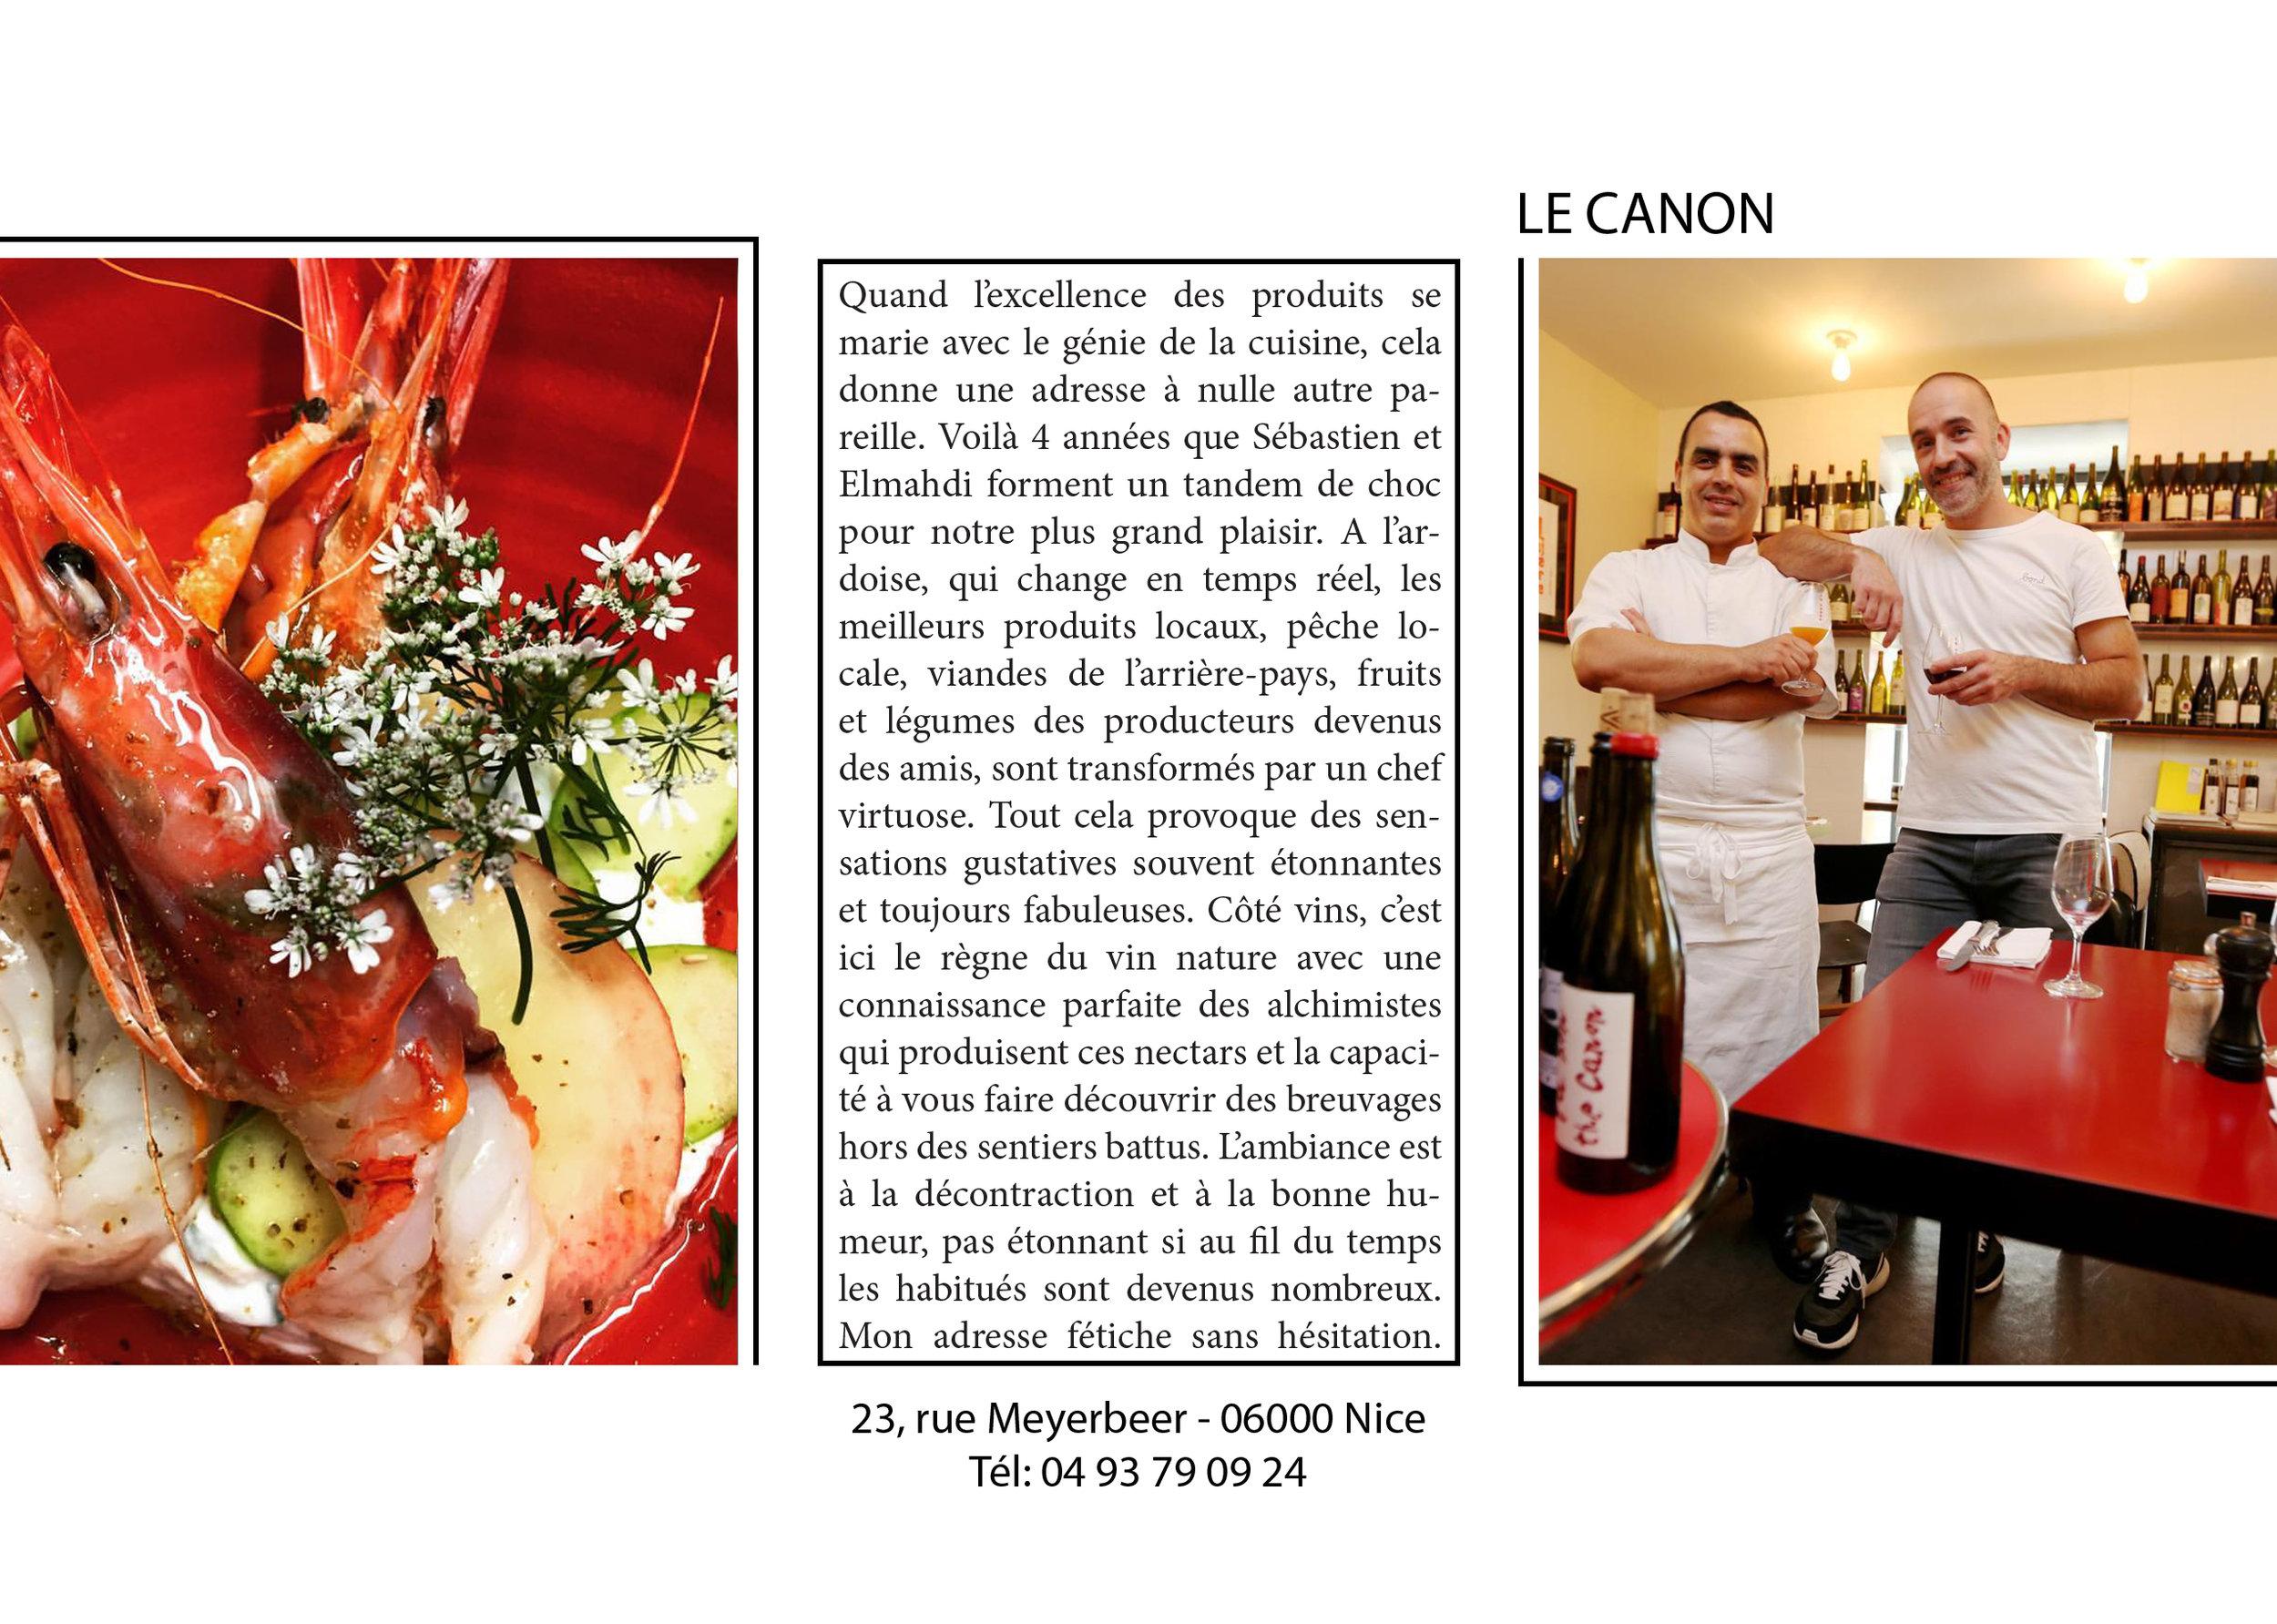 lecanon.jpg